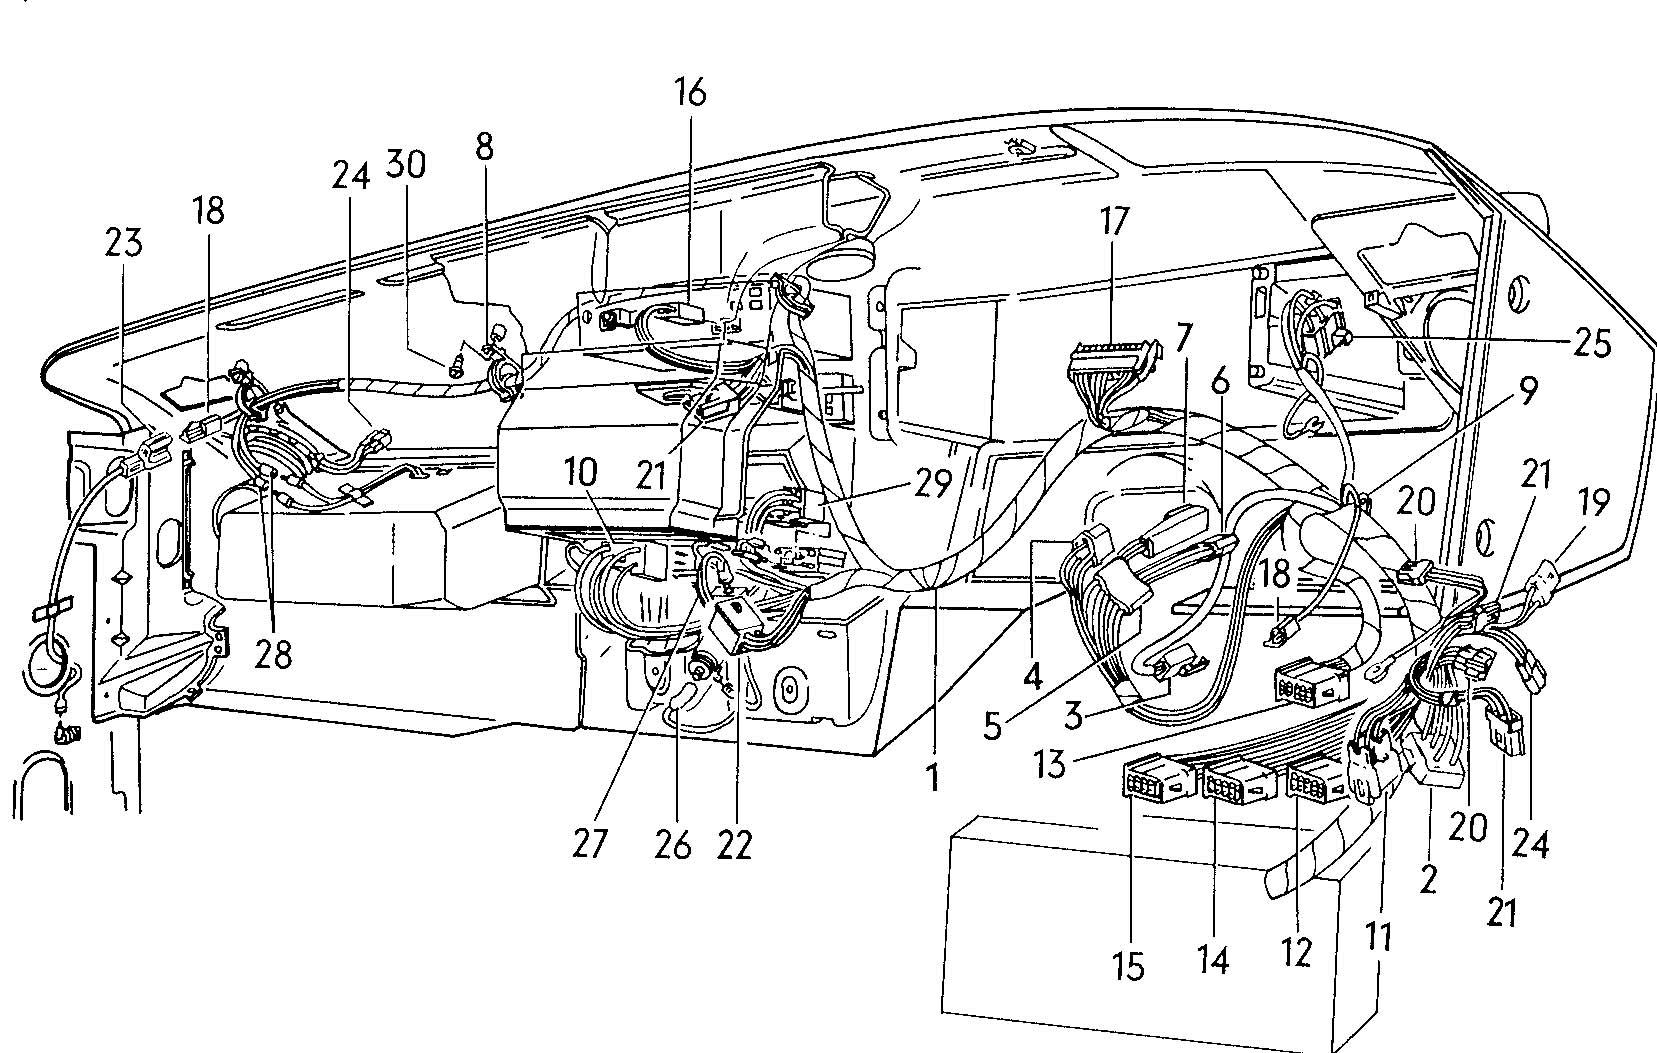 1982 Volkswagen Rabbit Dashboard harness